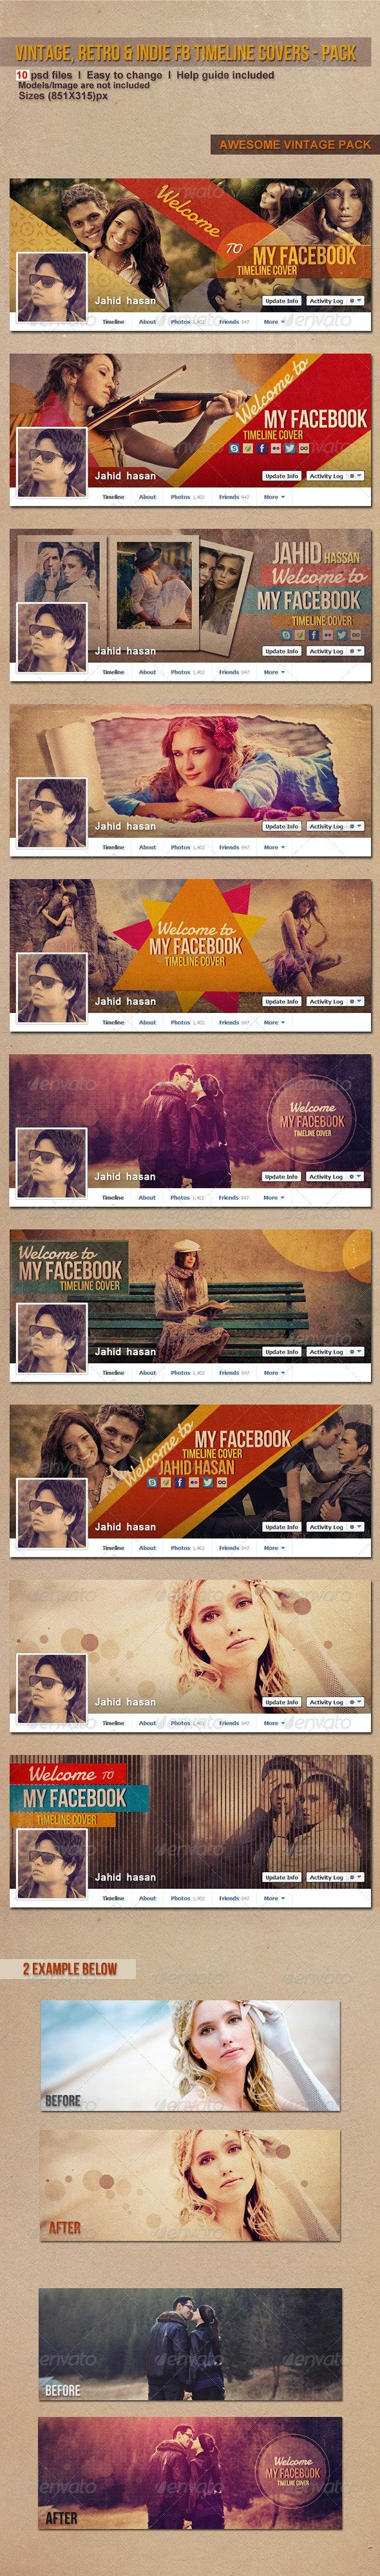 Vintage, Retro & Indie FB Timeline Covers - Pack - Facebook Timeline Covers Social Media